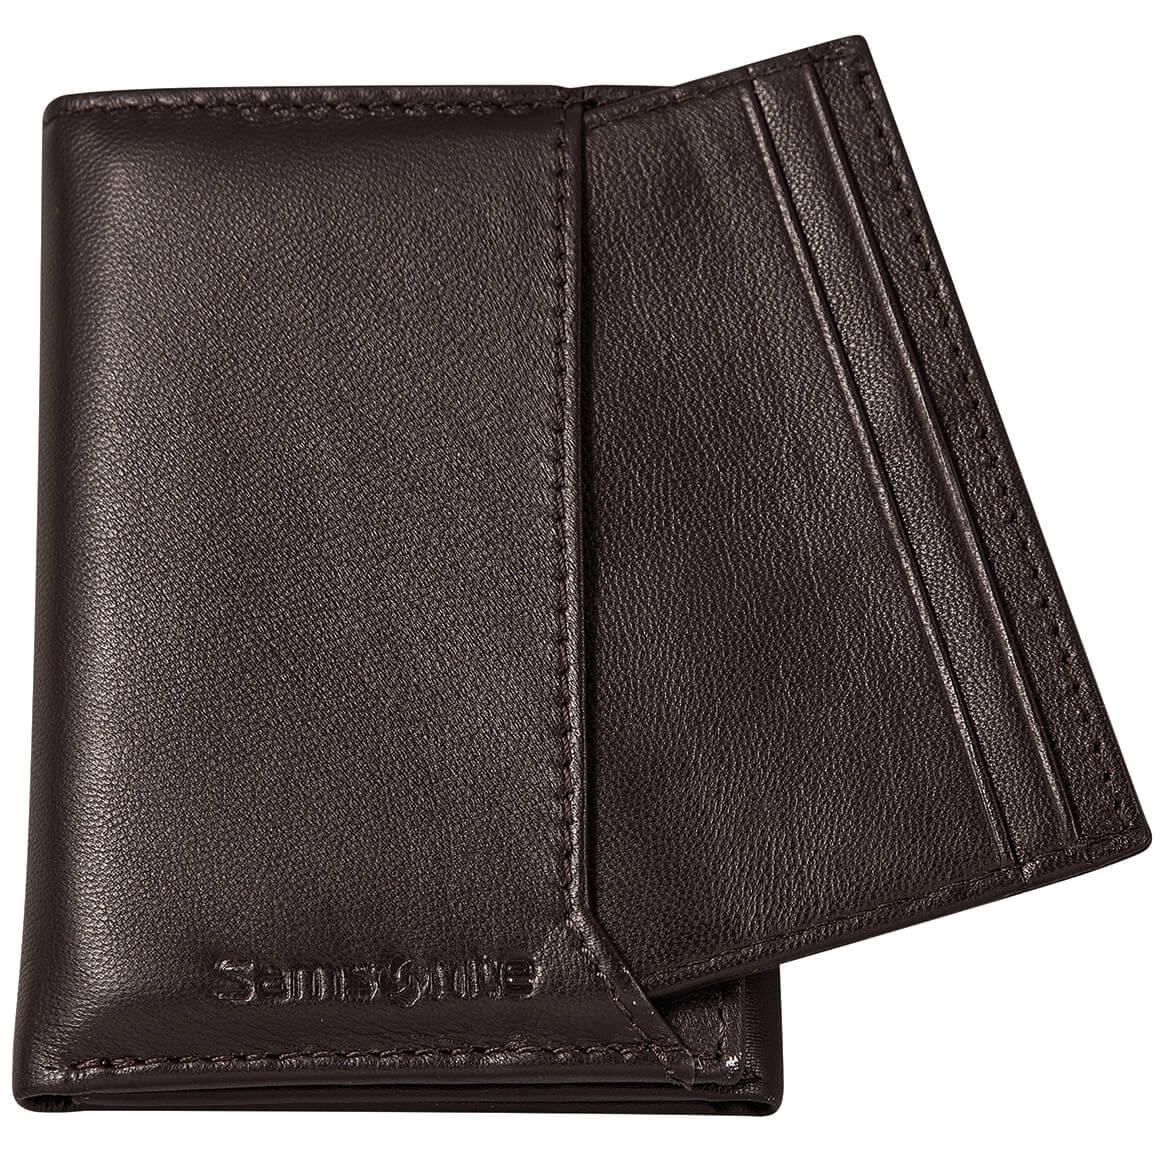 Samsonite Trifold RFID Leather Wallet-369309